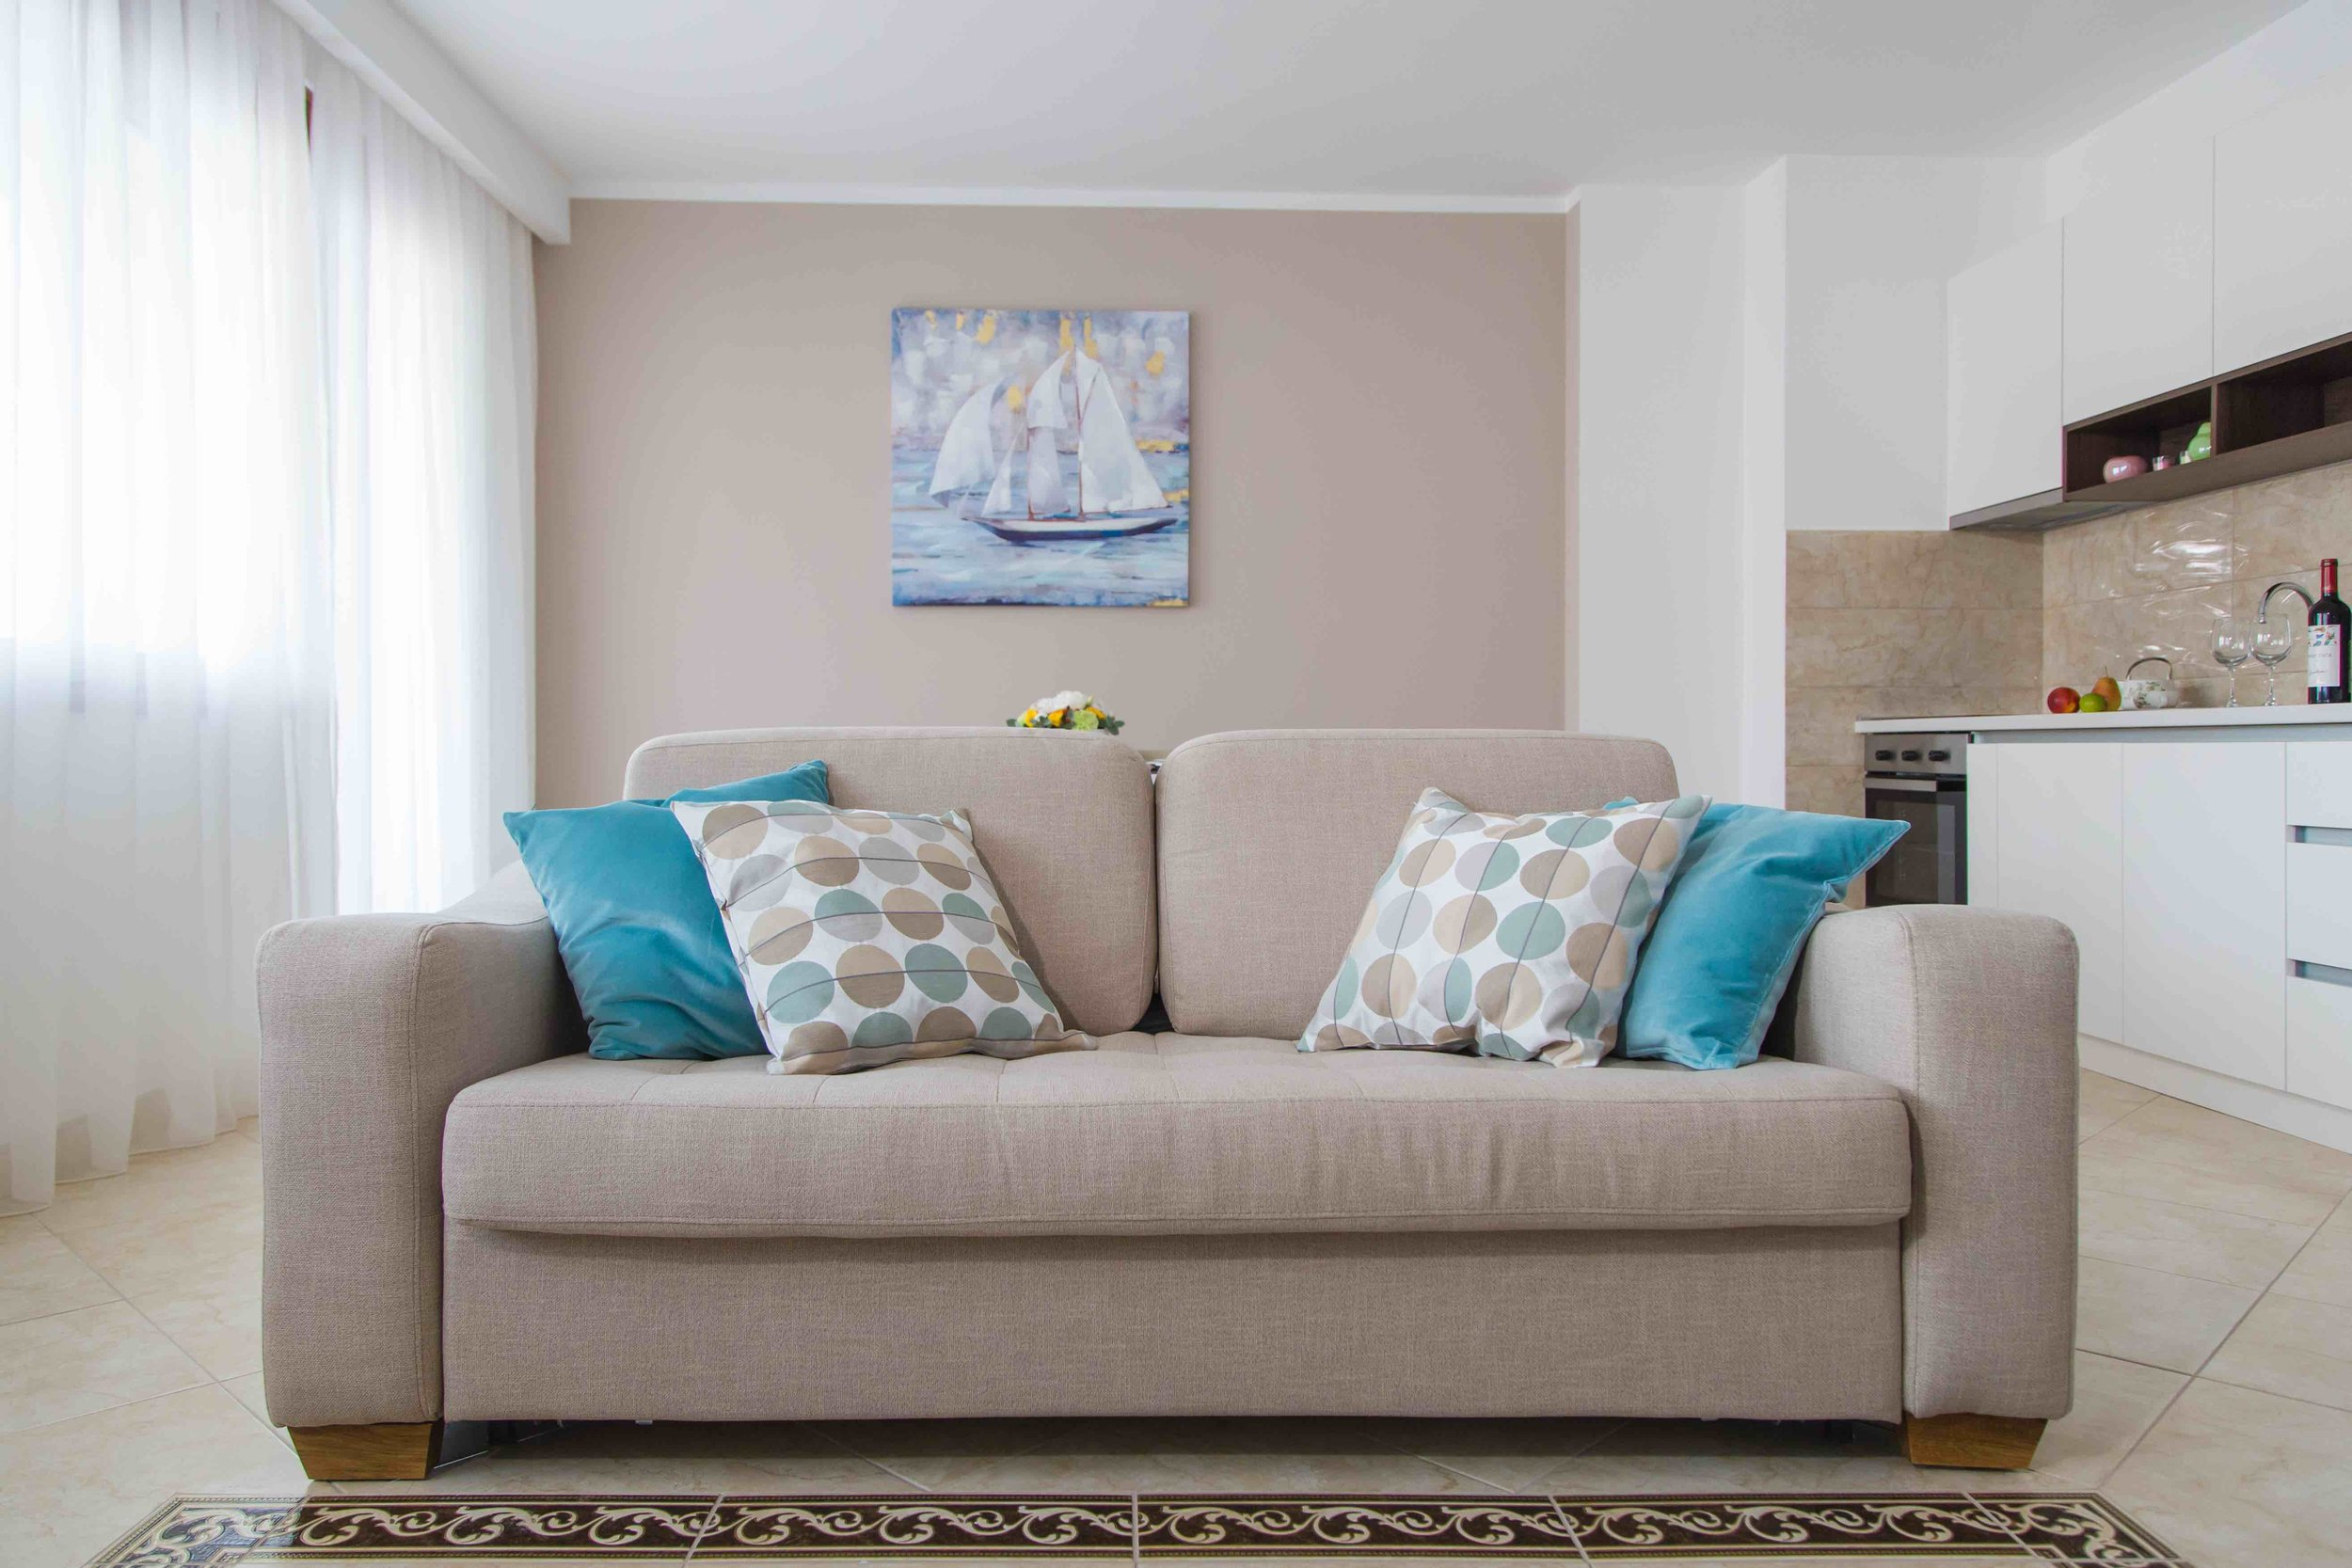 Aparthotel Апартотель | Anatolia |Becici Бечичи | Budva Будва | Montenegro Черногория | Apartments Апартаменты | Rents Аренда 3.jpg